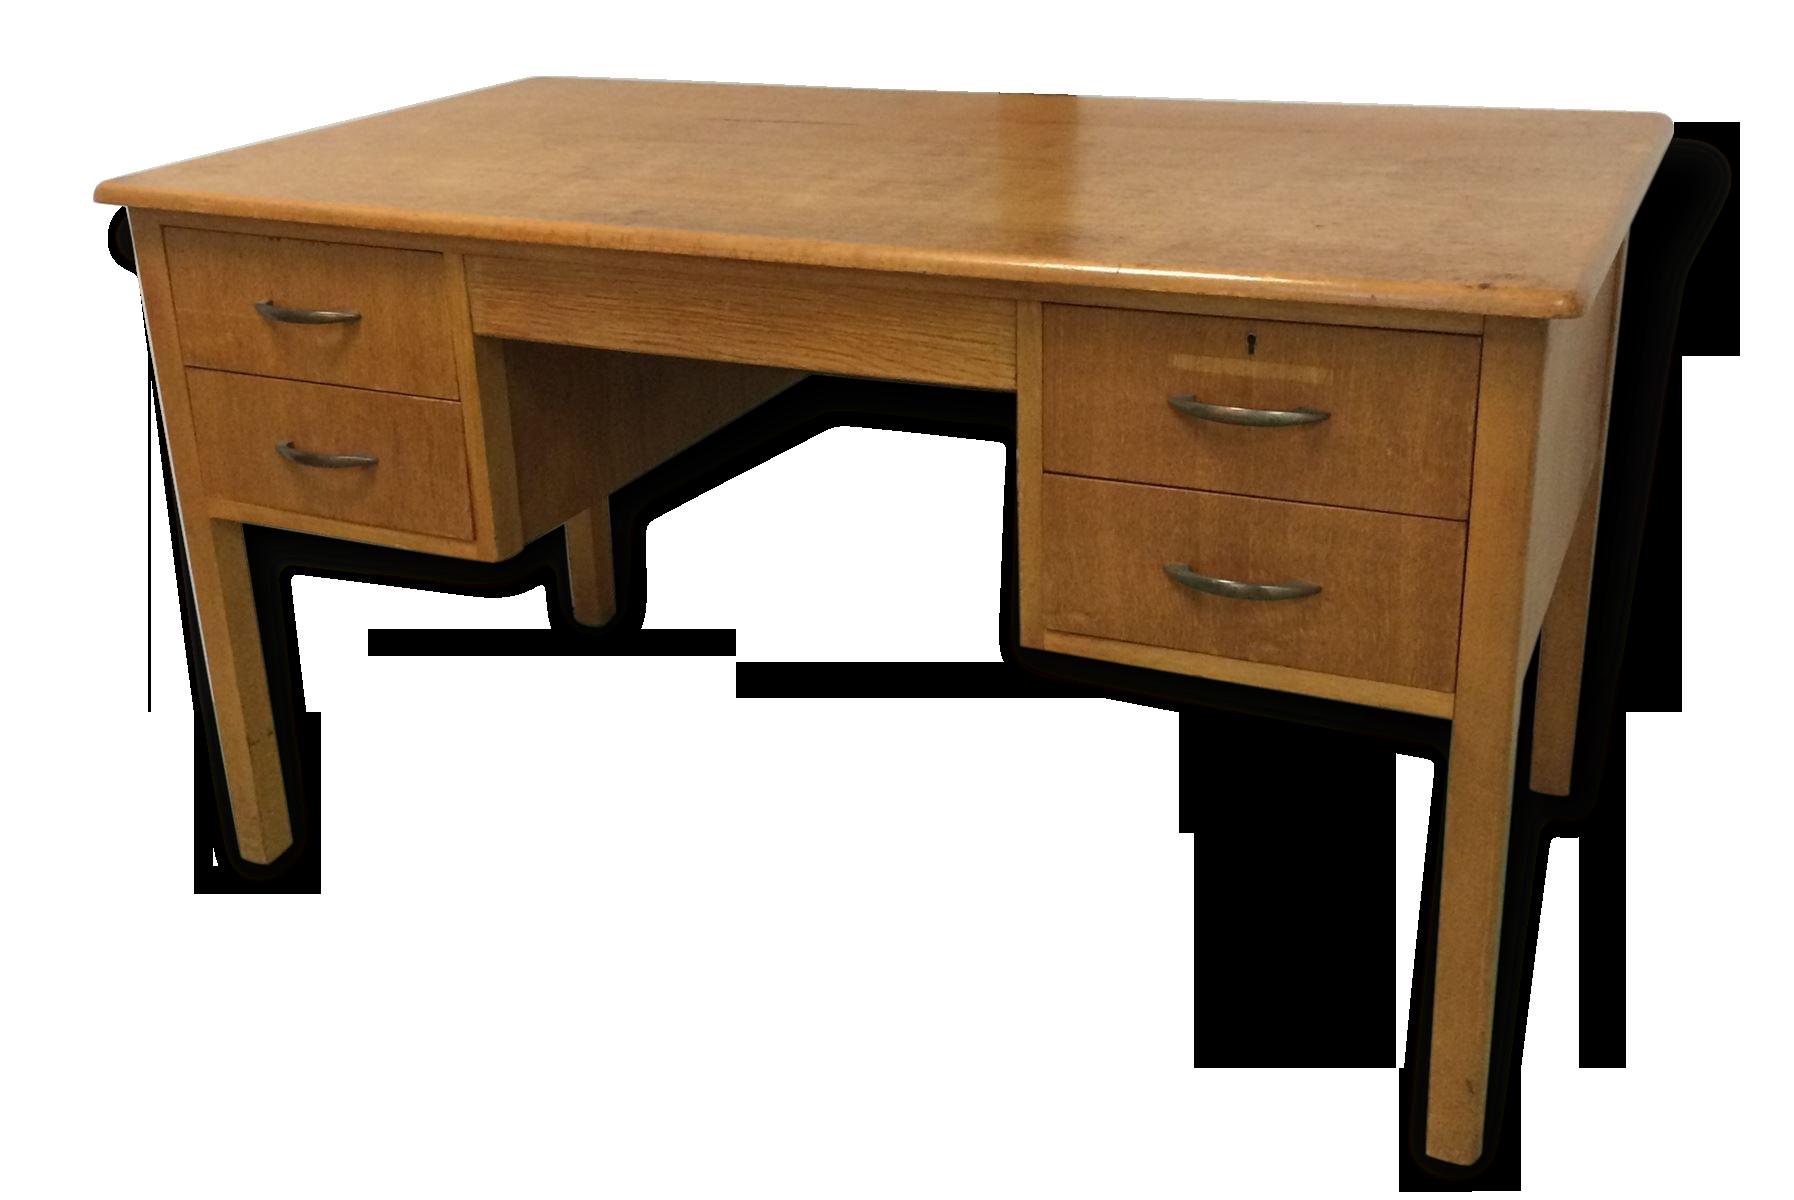 Bureau anglais en bois meuble salon bois clair blanc bas massif